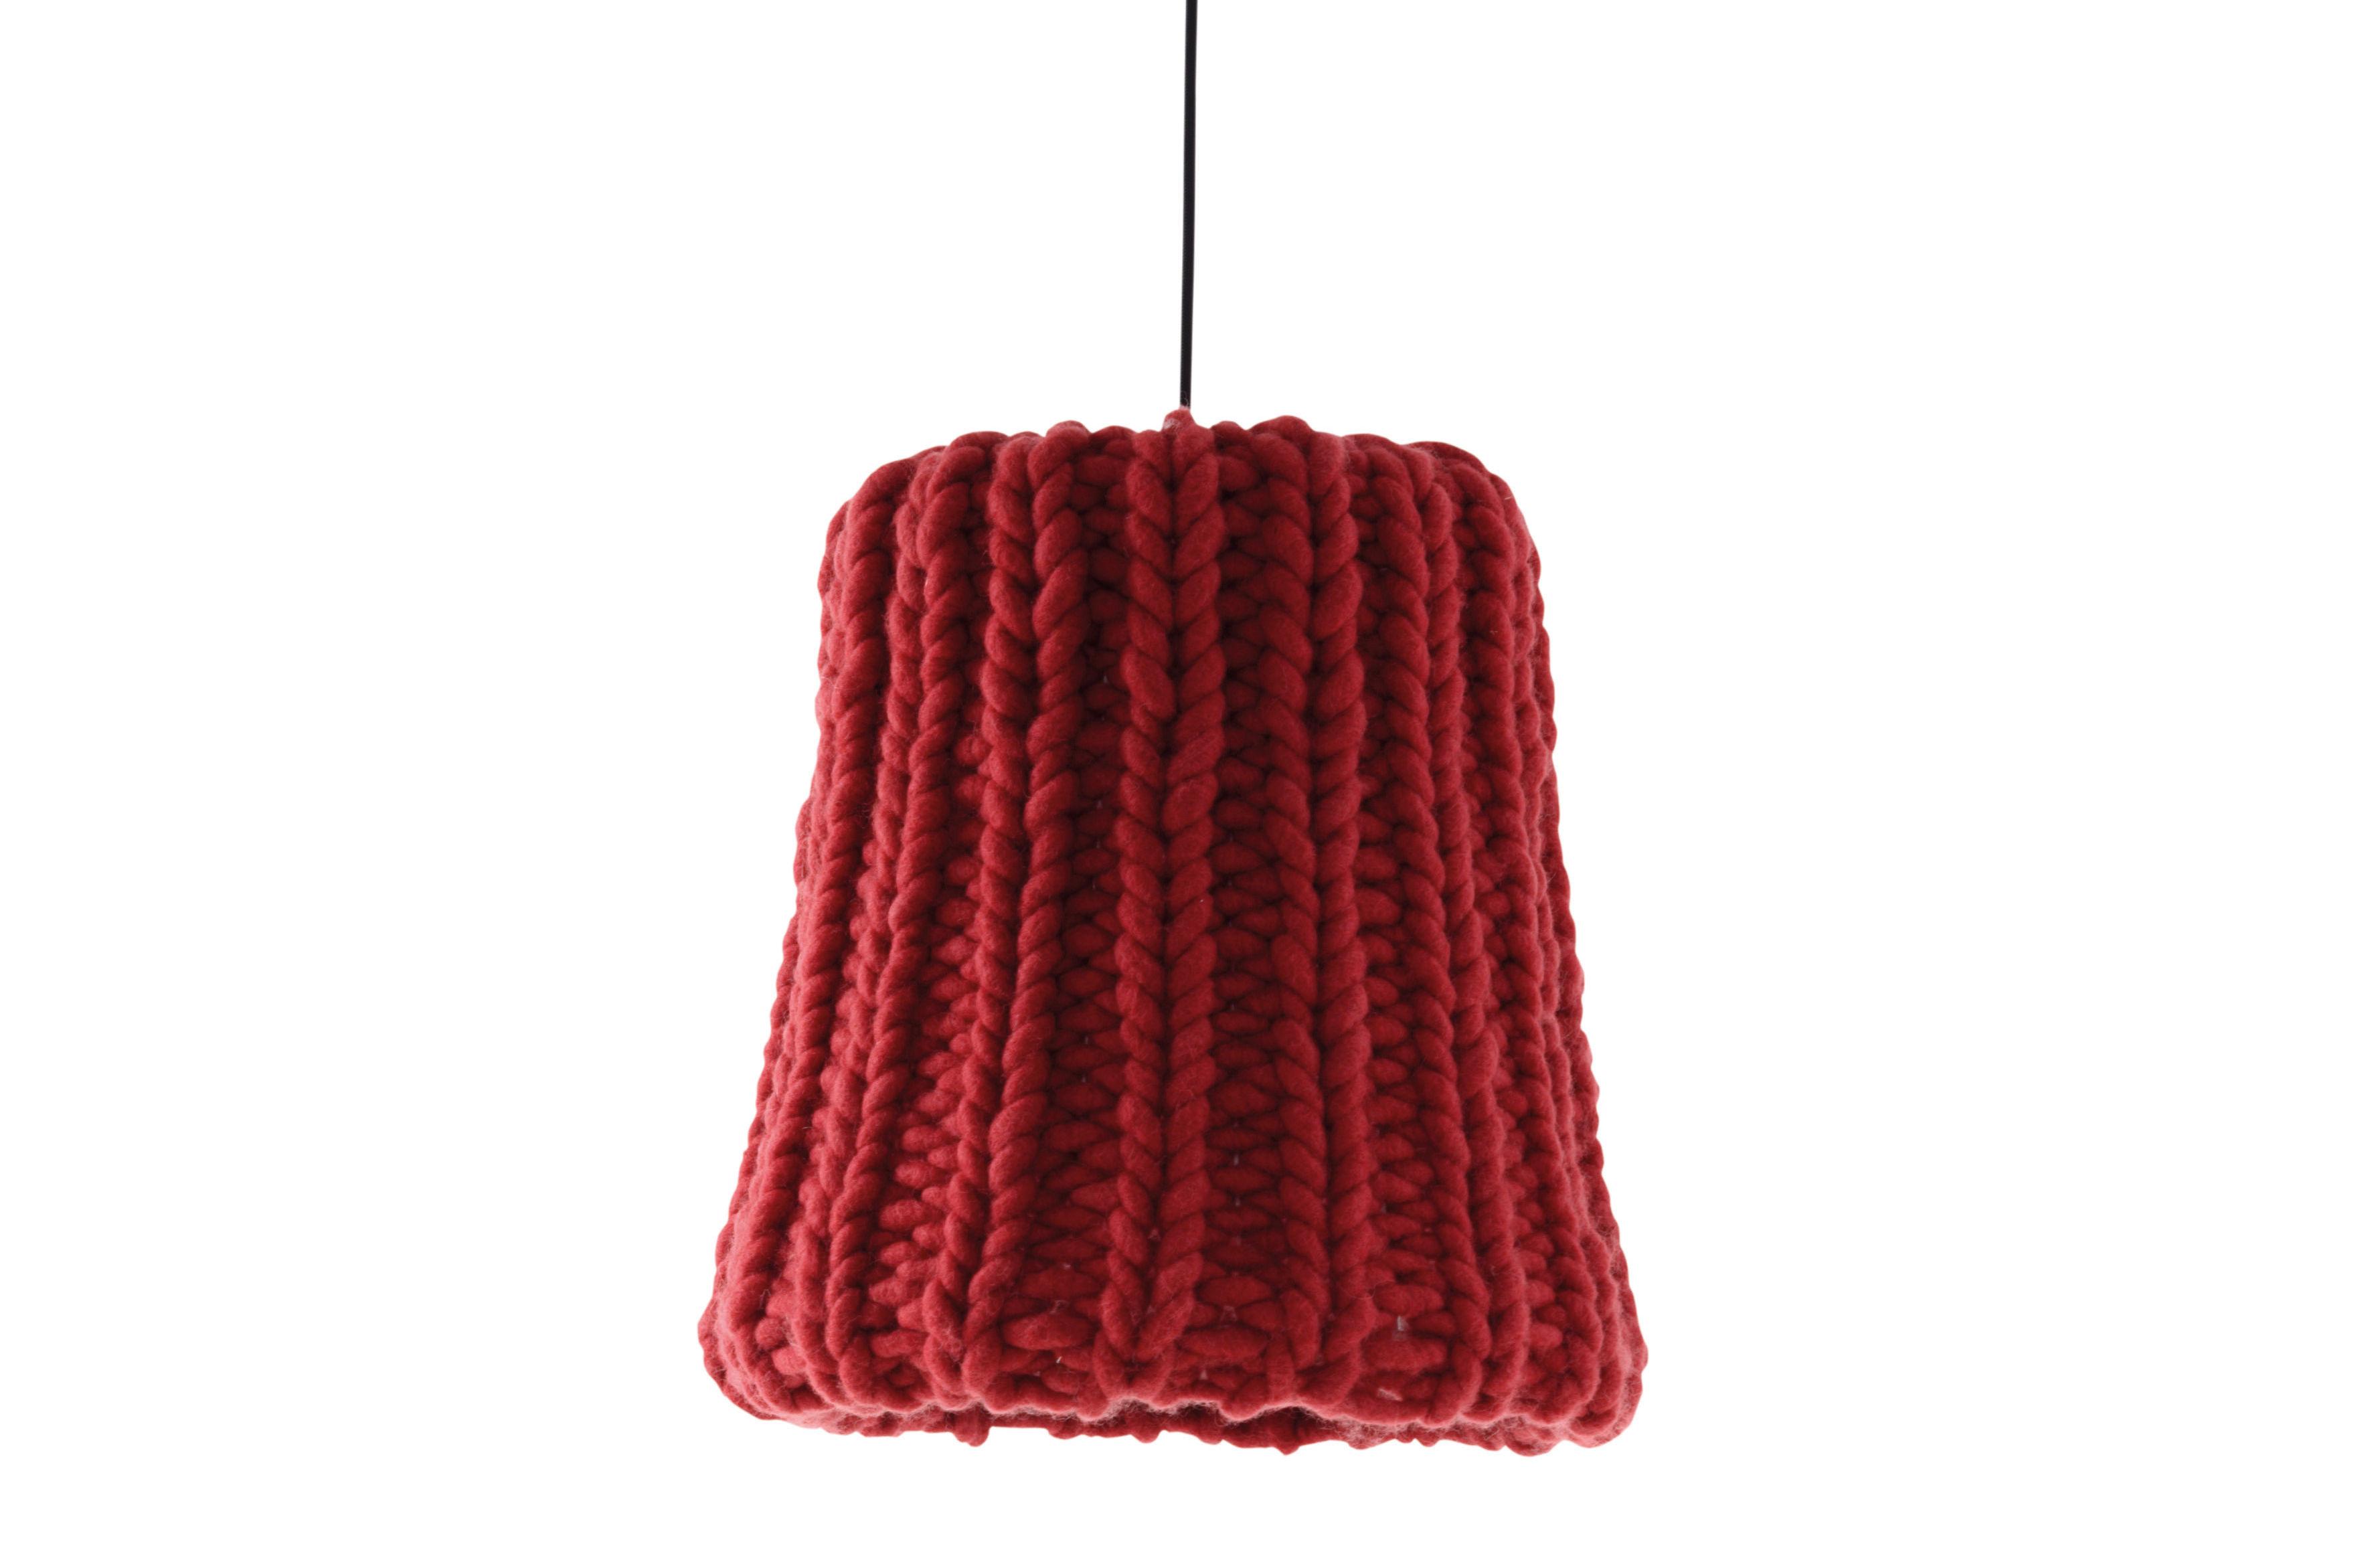 Luminaire - Suspensions - Suspension Granny Small / Ø 17,5 cm - Casamania - Framboise / Câble noir - Laine